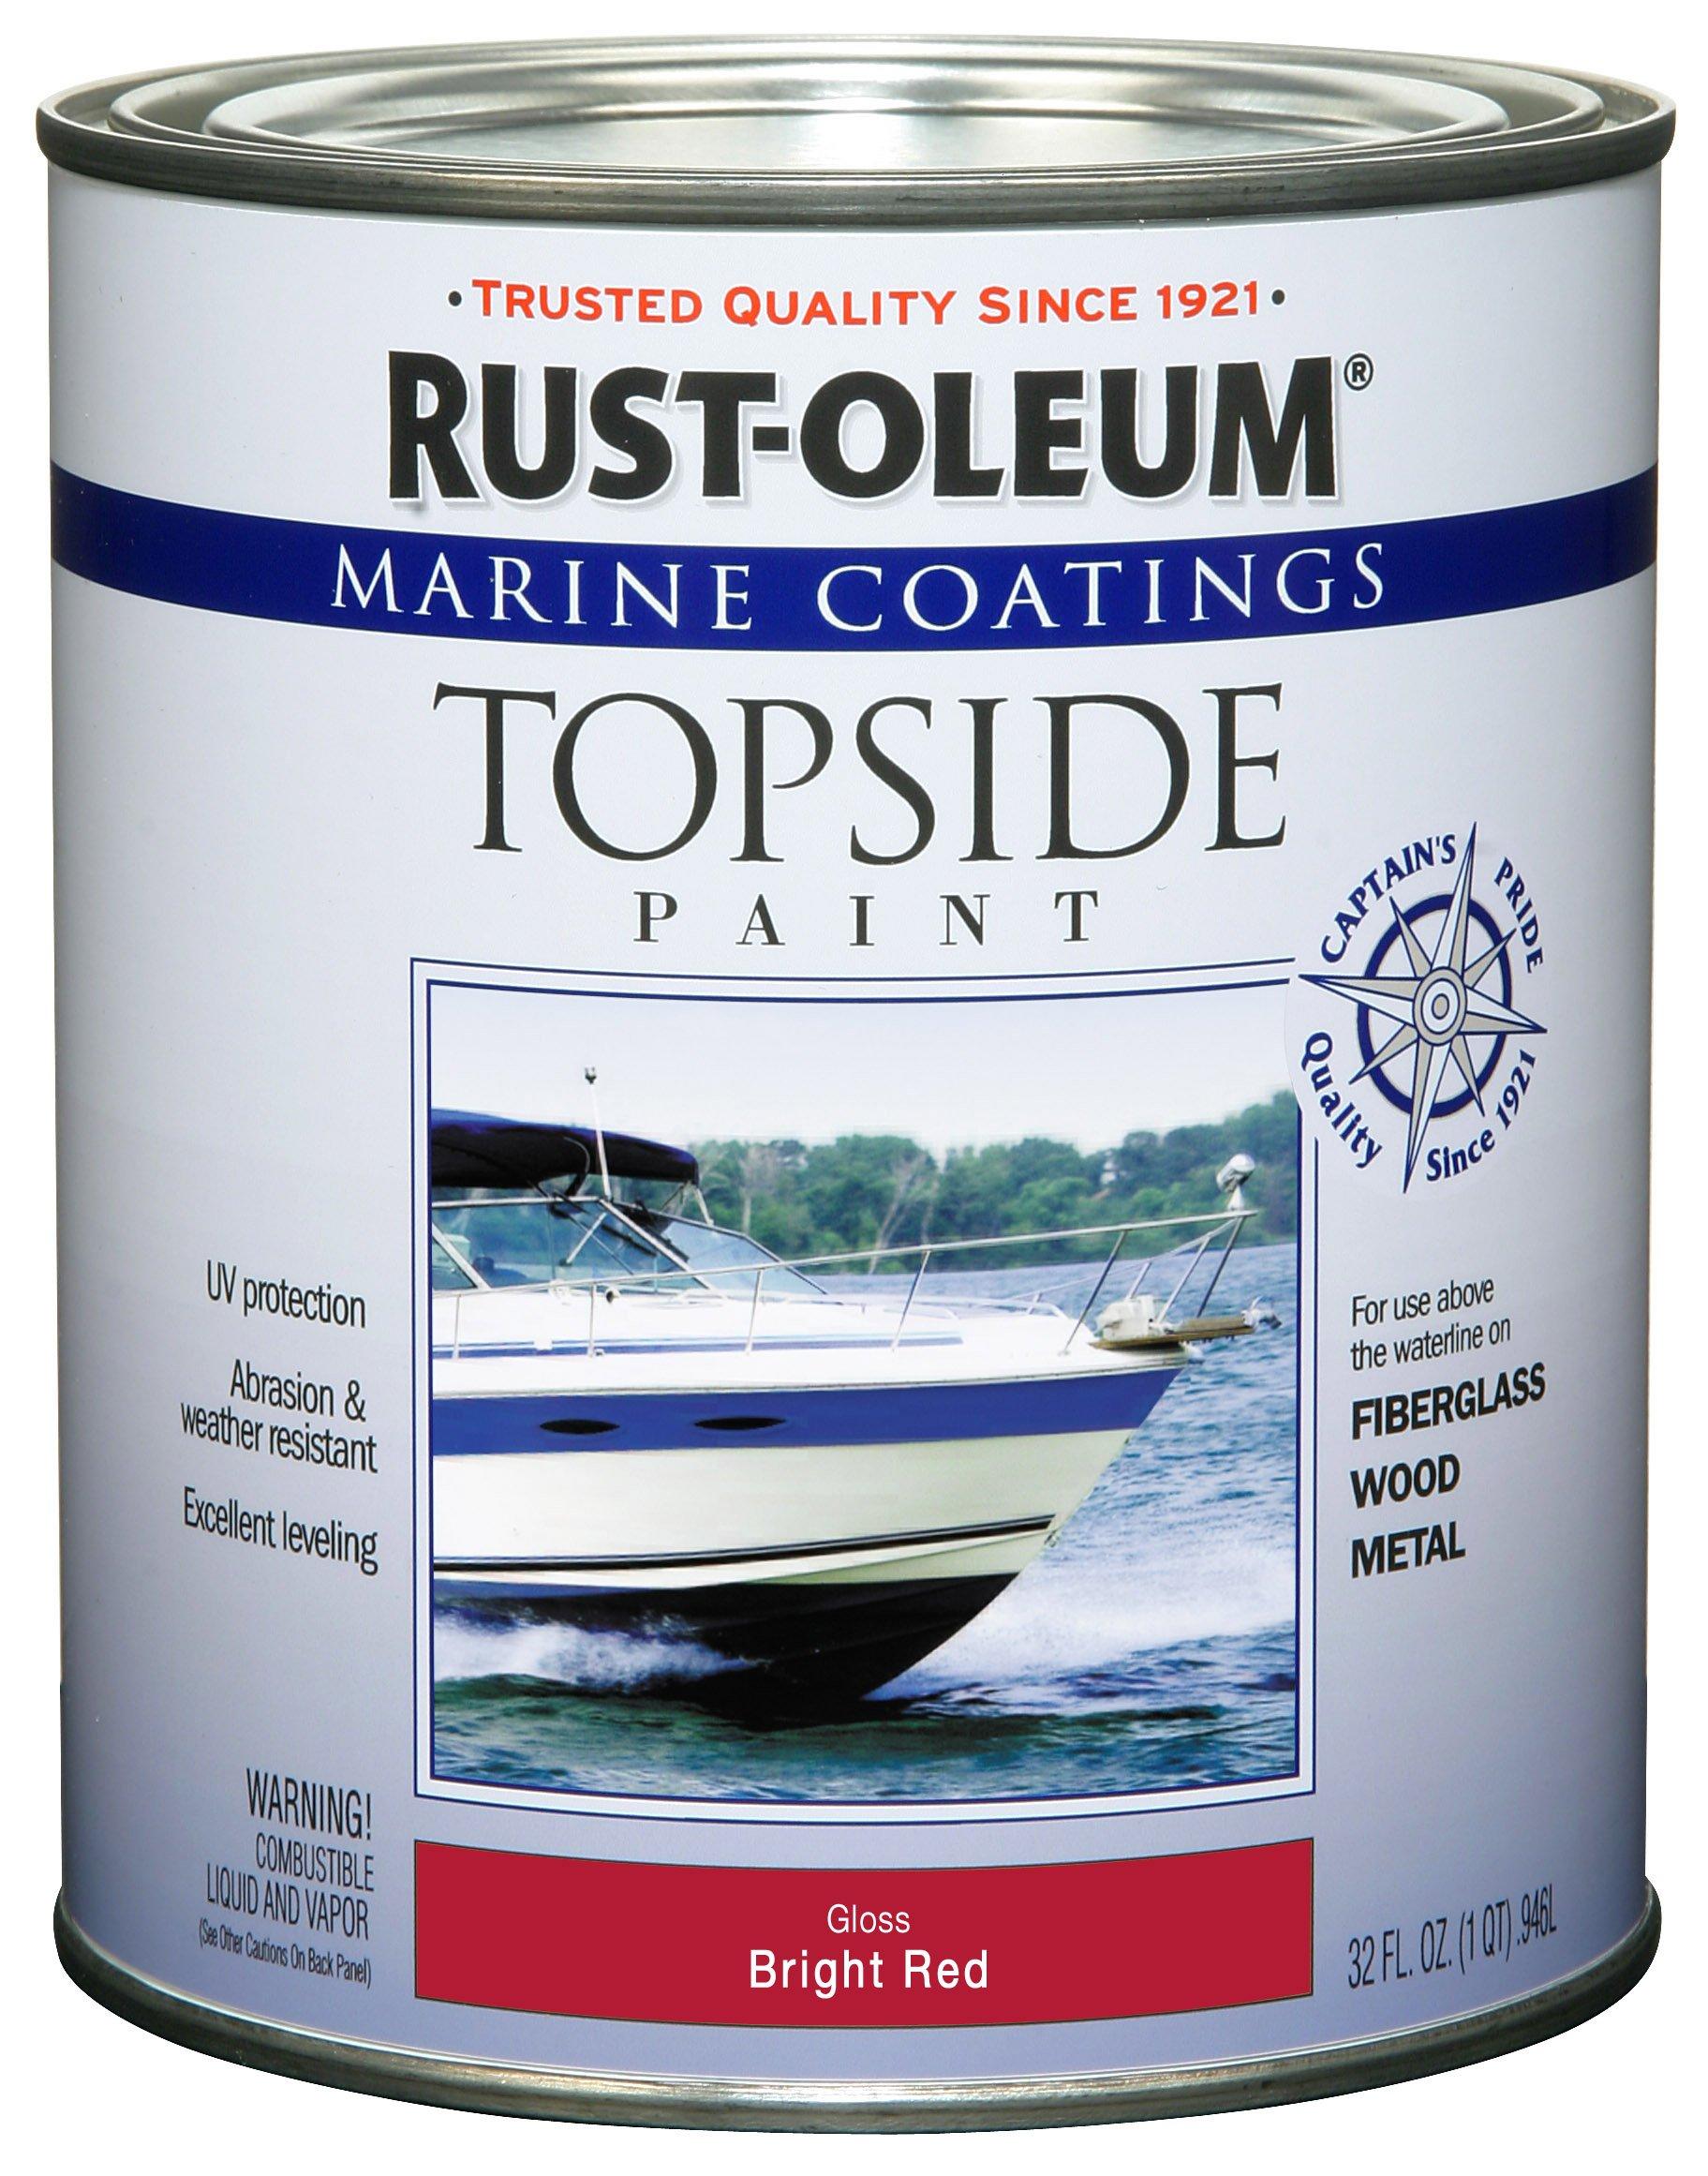 Rust-Oleum 207004 Marine Coatings Topside Paint, Quart, Bright Red